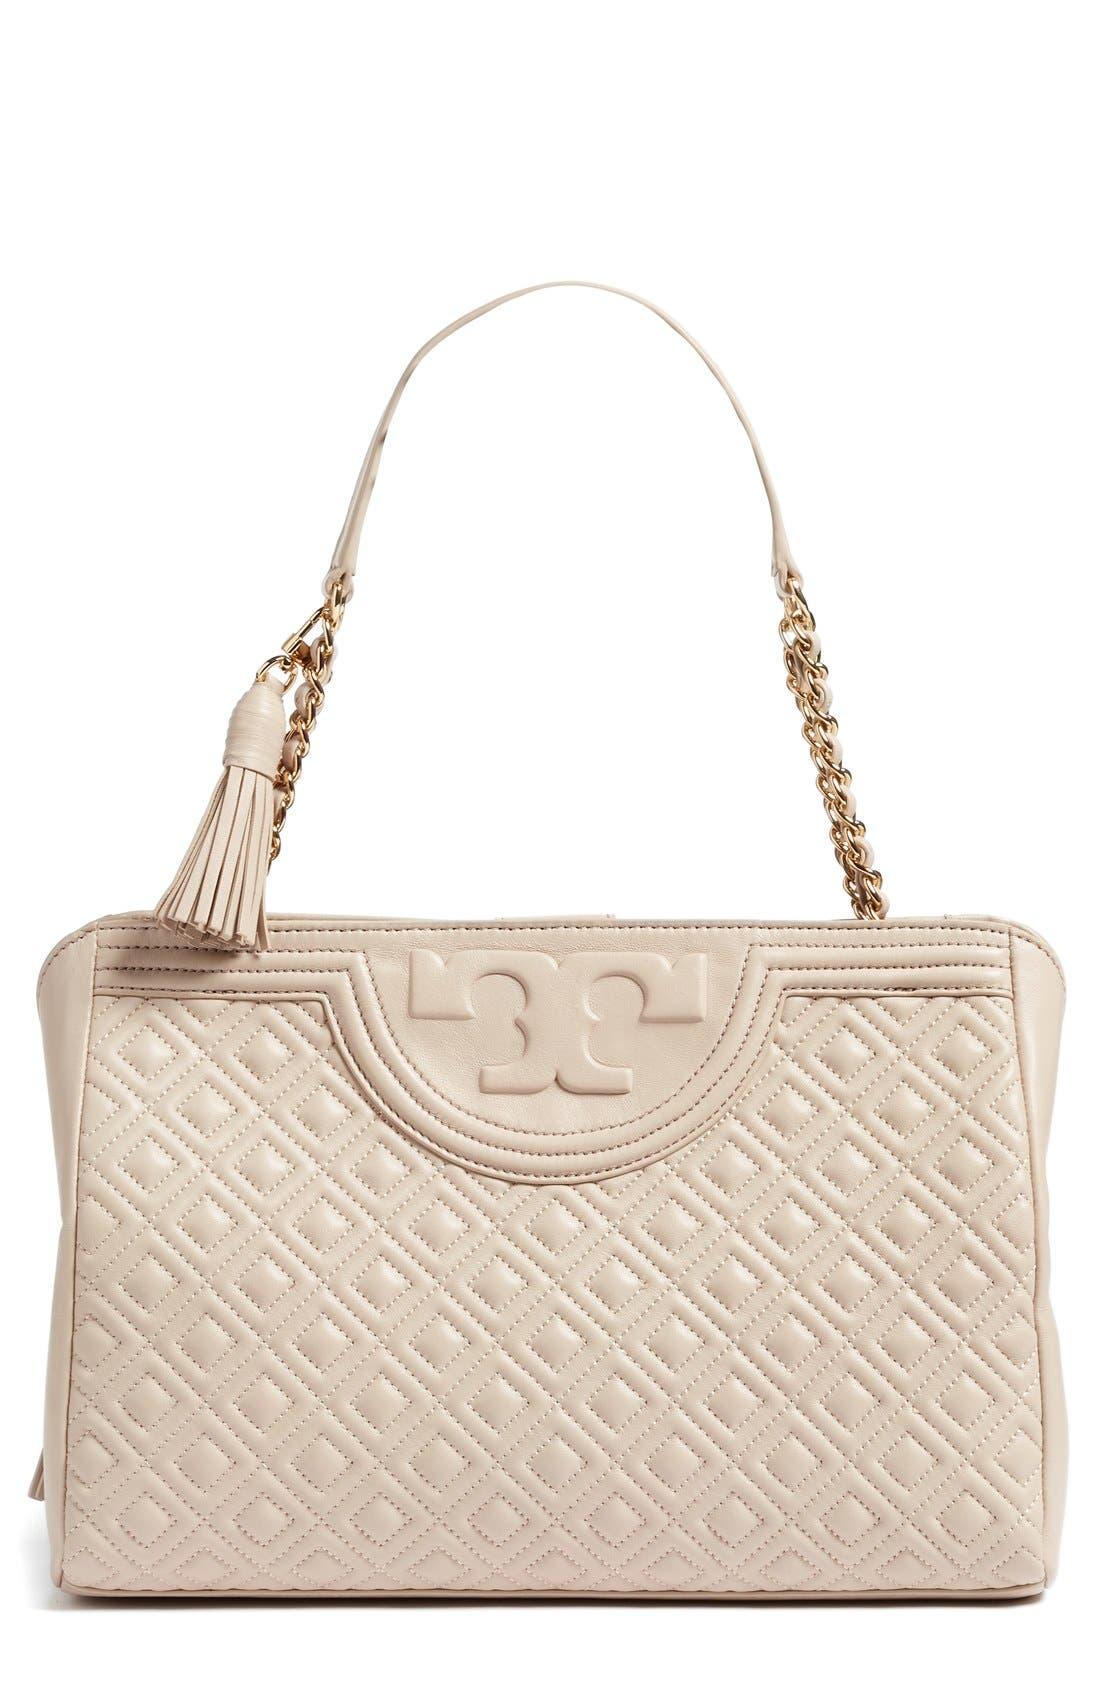 Alternate Image 1 Selected - Tory Burch Fleming Leather Shoulder Bag